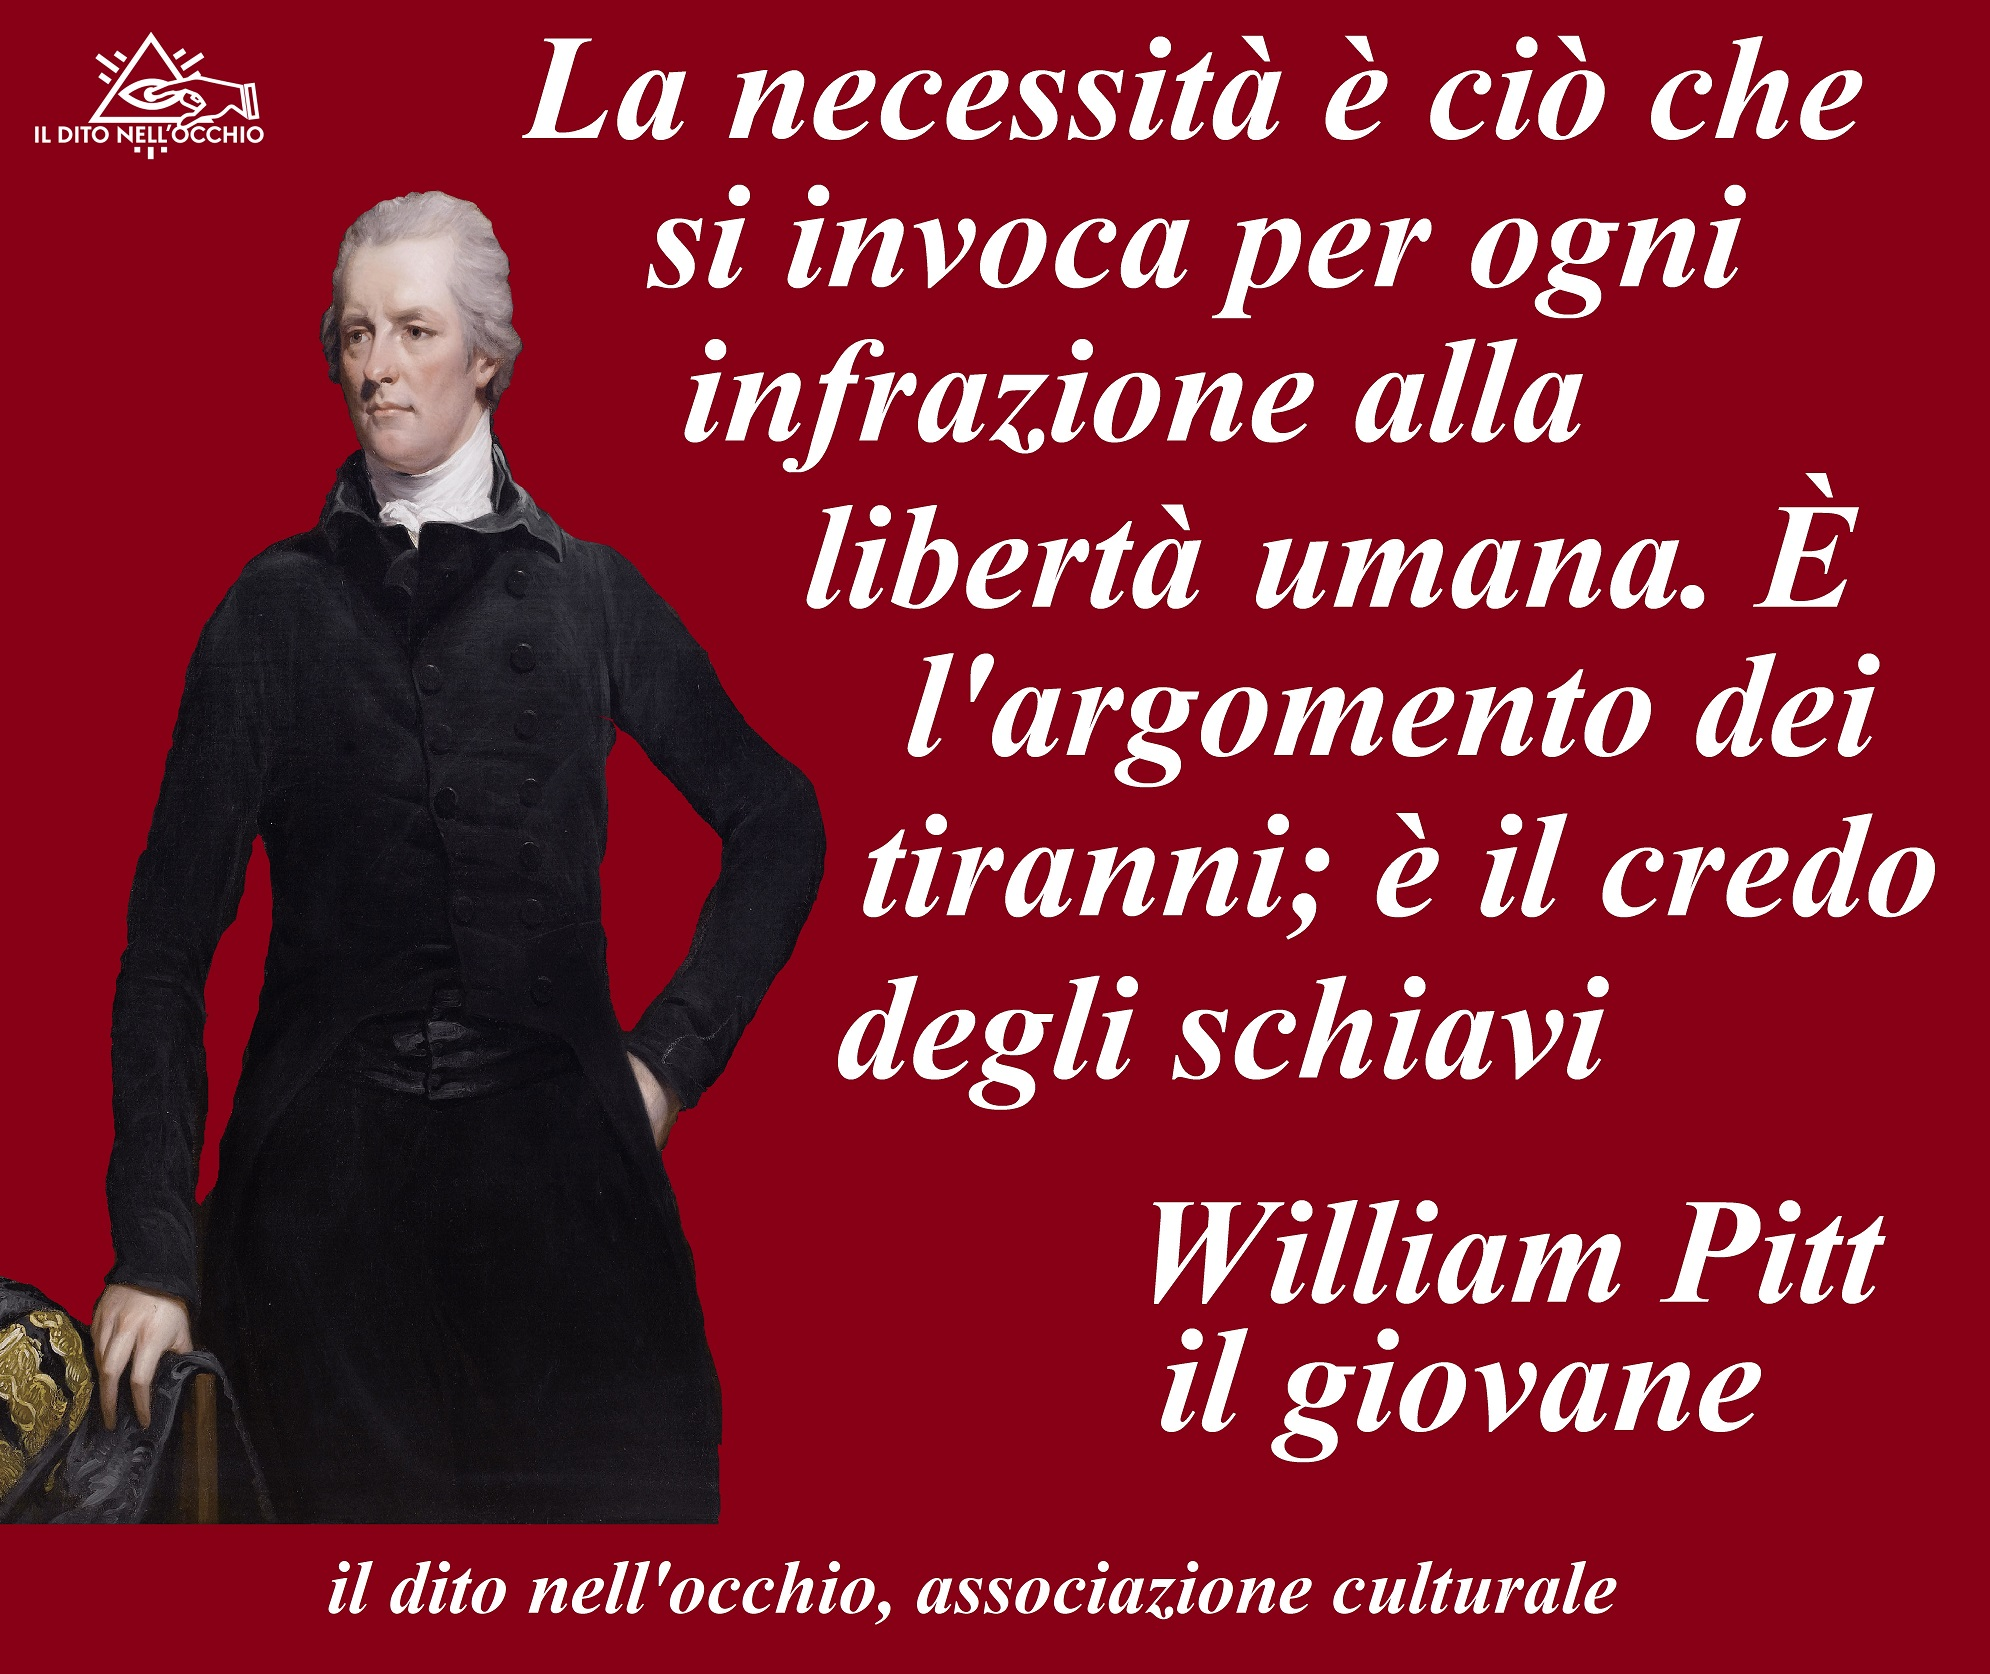 William Pitt il giovane